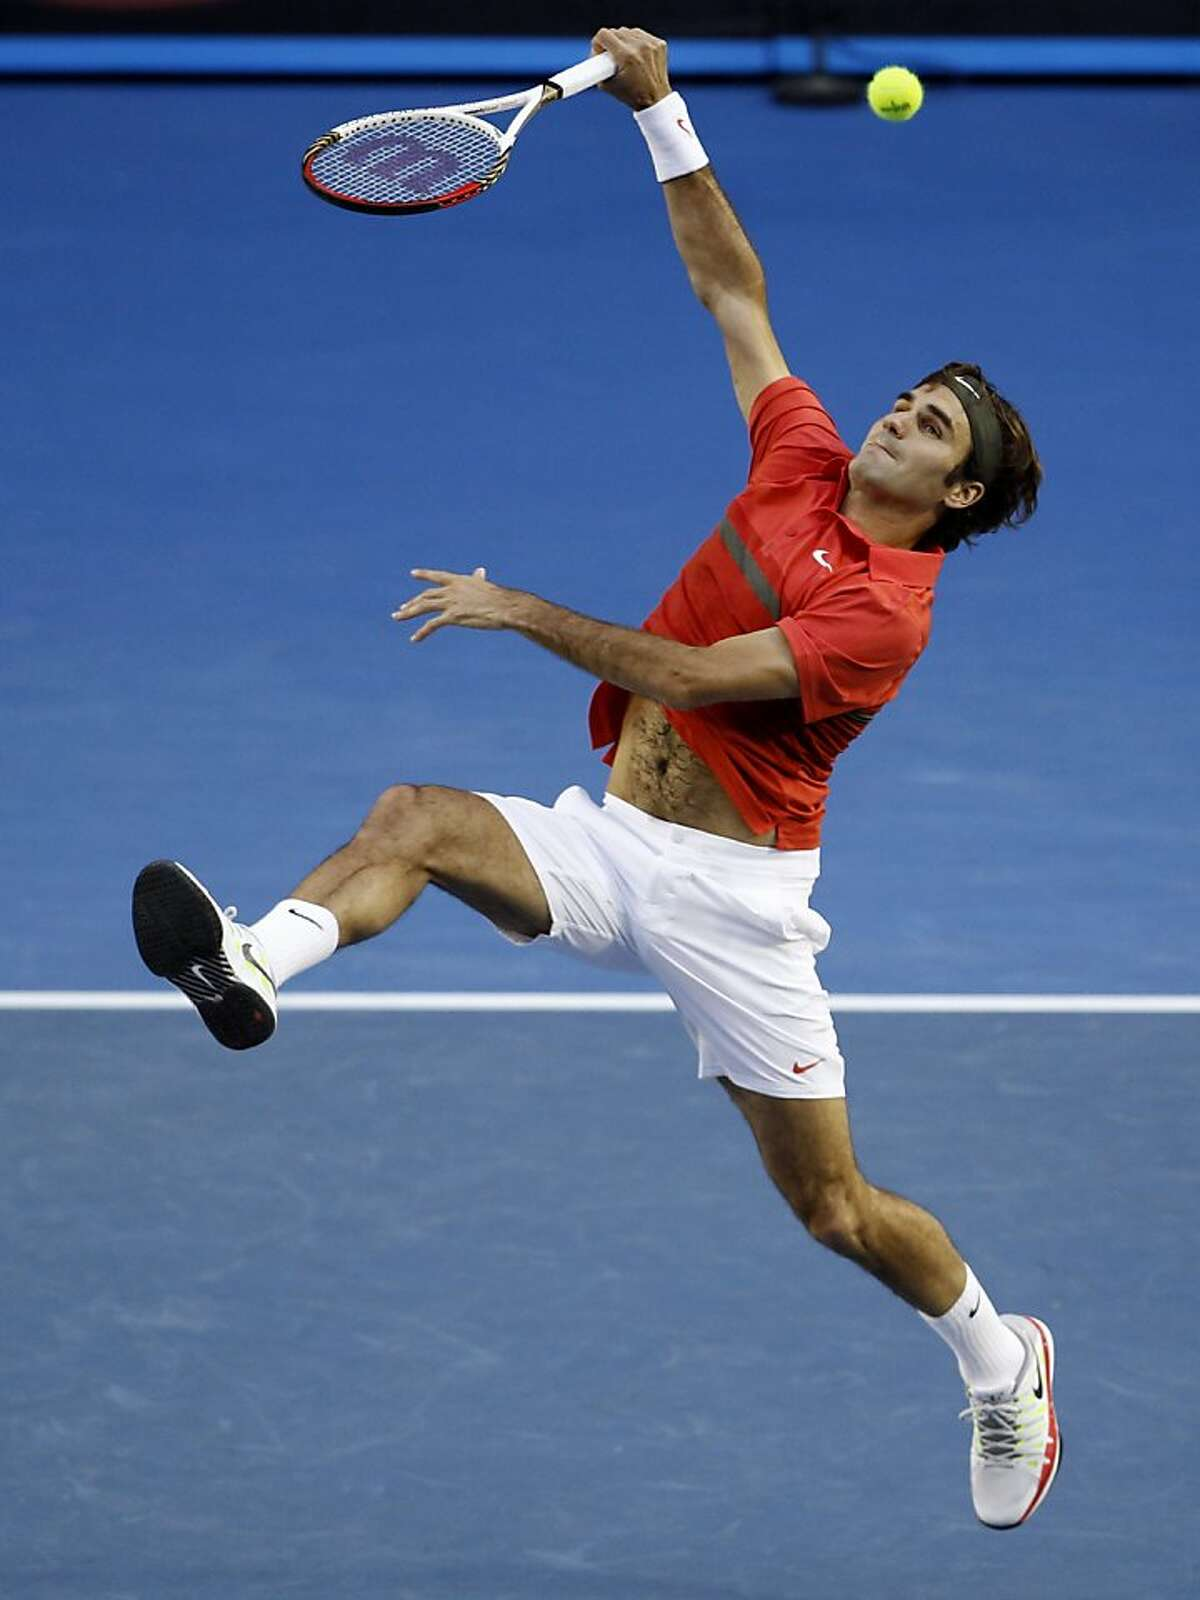 Roger Federer of Switzerland leaps for a smash against Rafael Nadal of Spain during their semifinal at the Australian Open tennis championship, in Melbourne, Australia, Thursday, Jan. 26, 2012. (AP Photo/Aaron Favila)